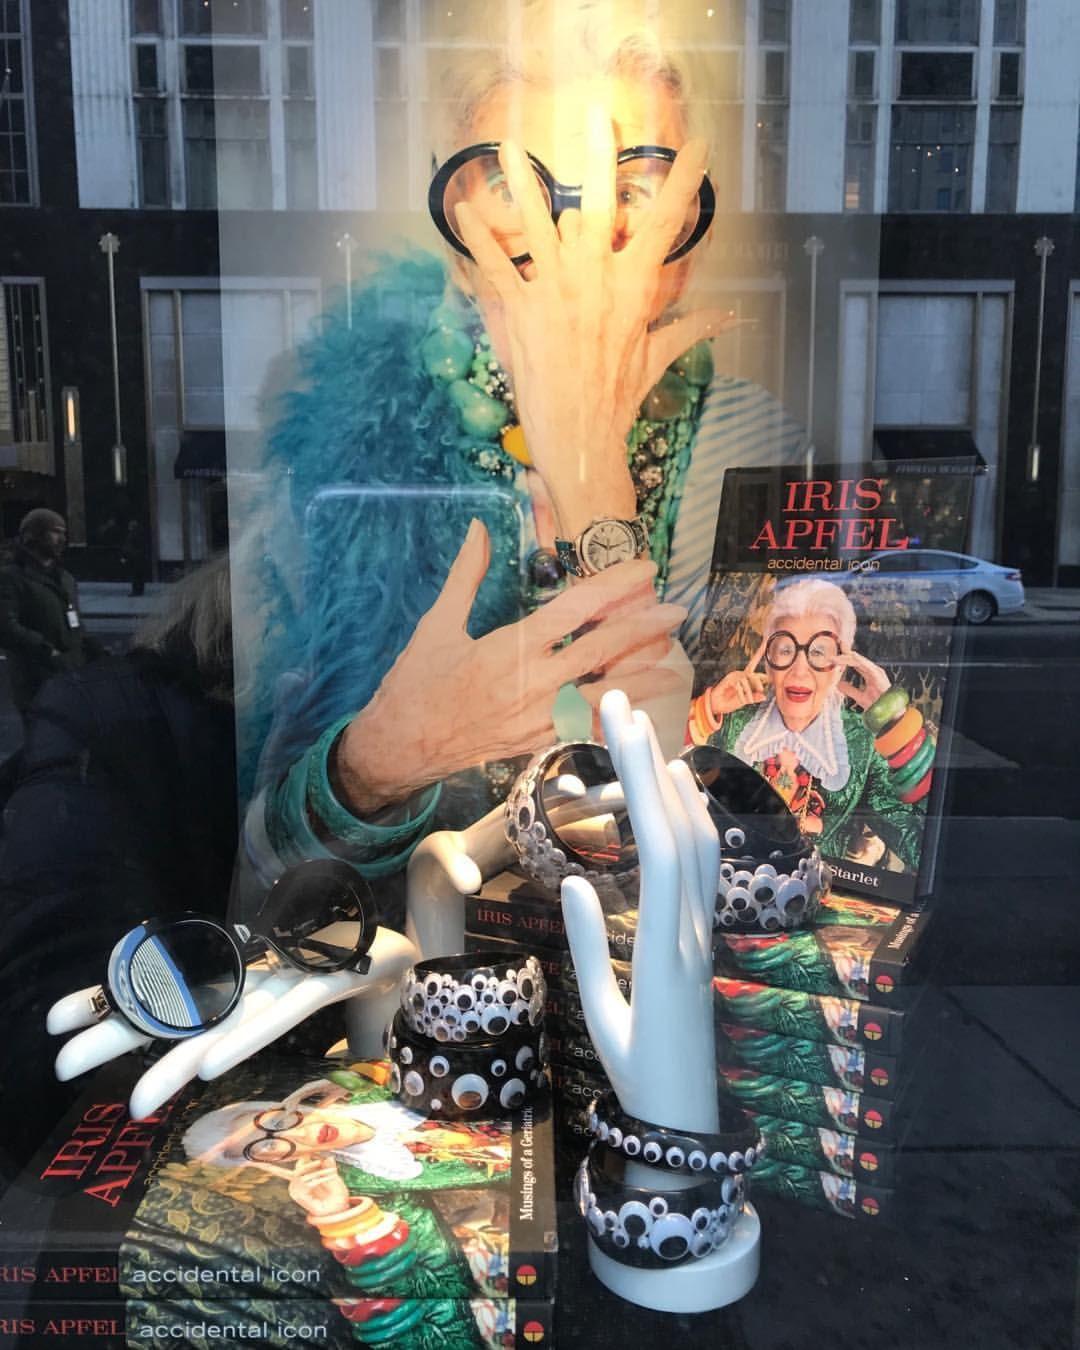 "BERGDORF GOODMAN, New York, ""Iris Apfel... Accidental Icon"", photo ... 0c4cfed5461"